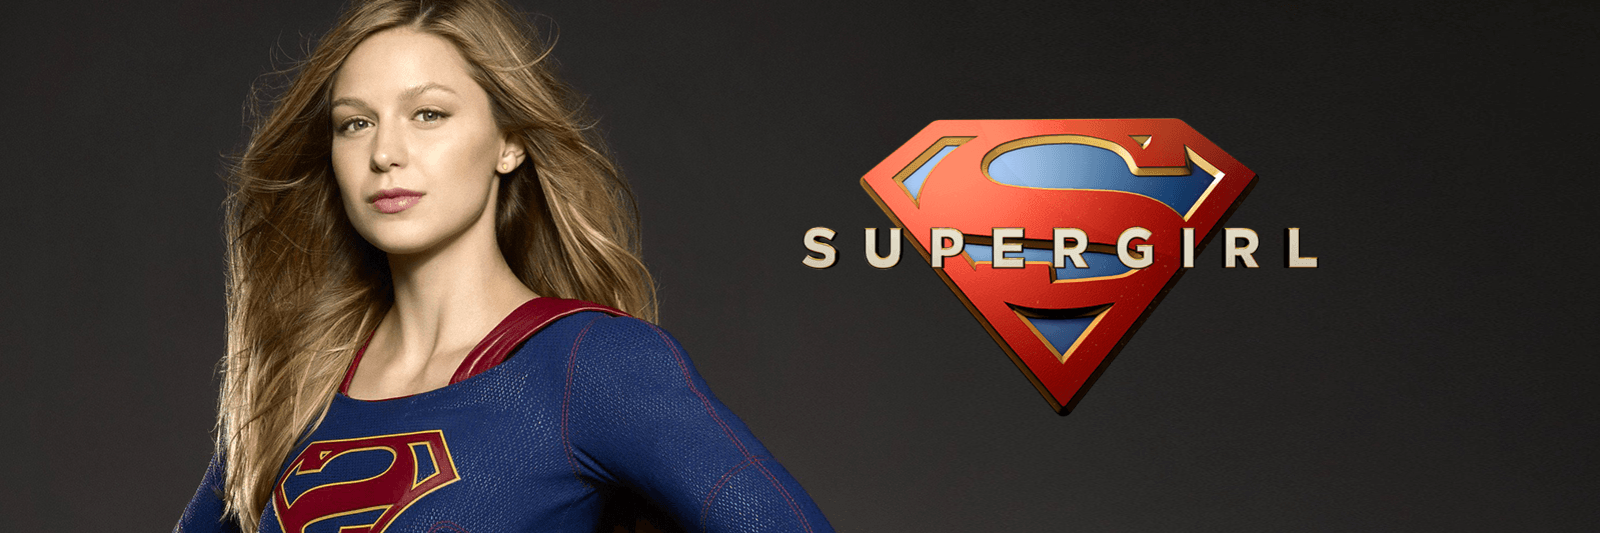 27 super girl big billboard 1600 x 533 004 pre